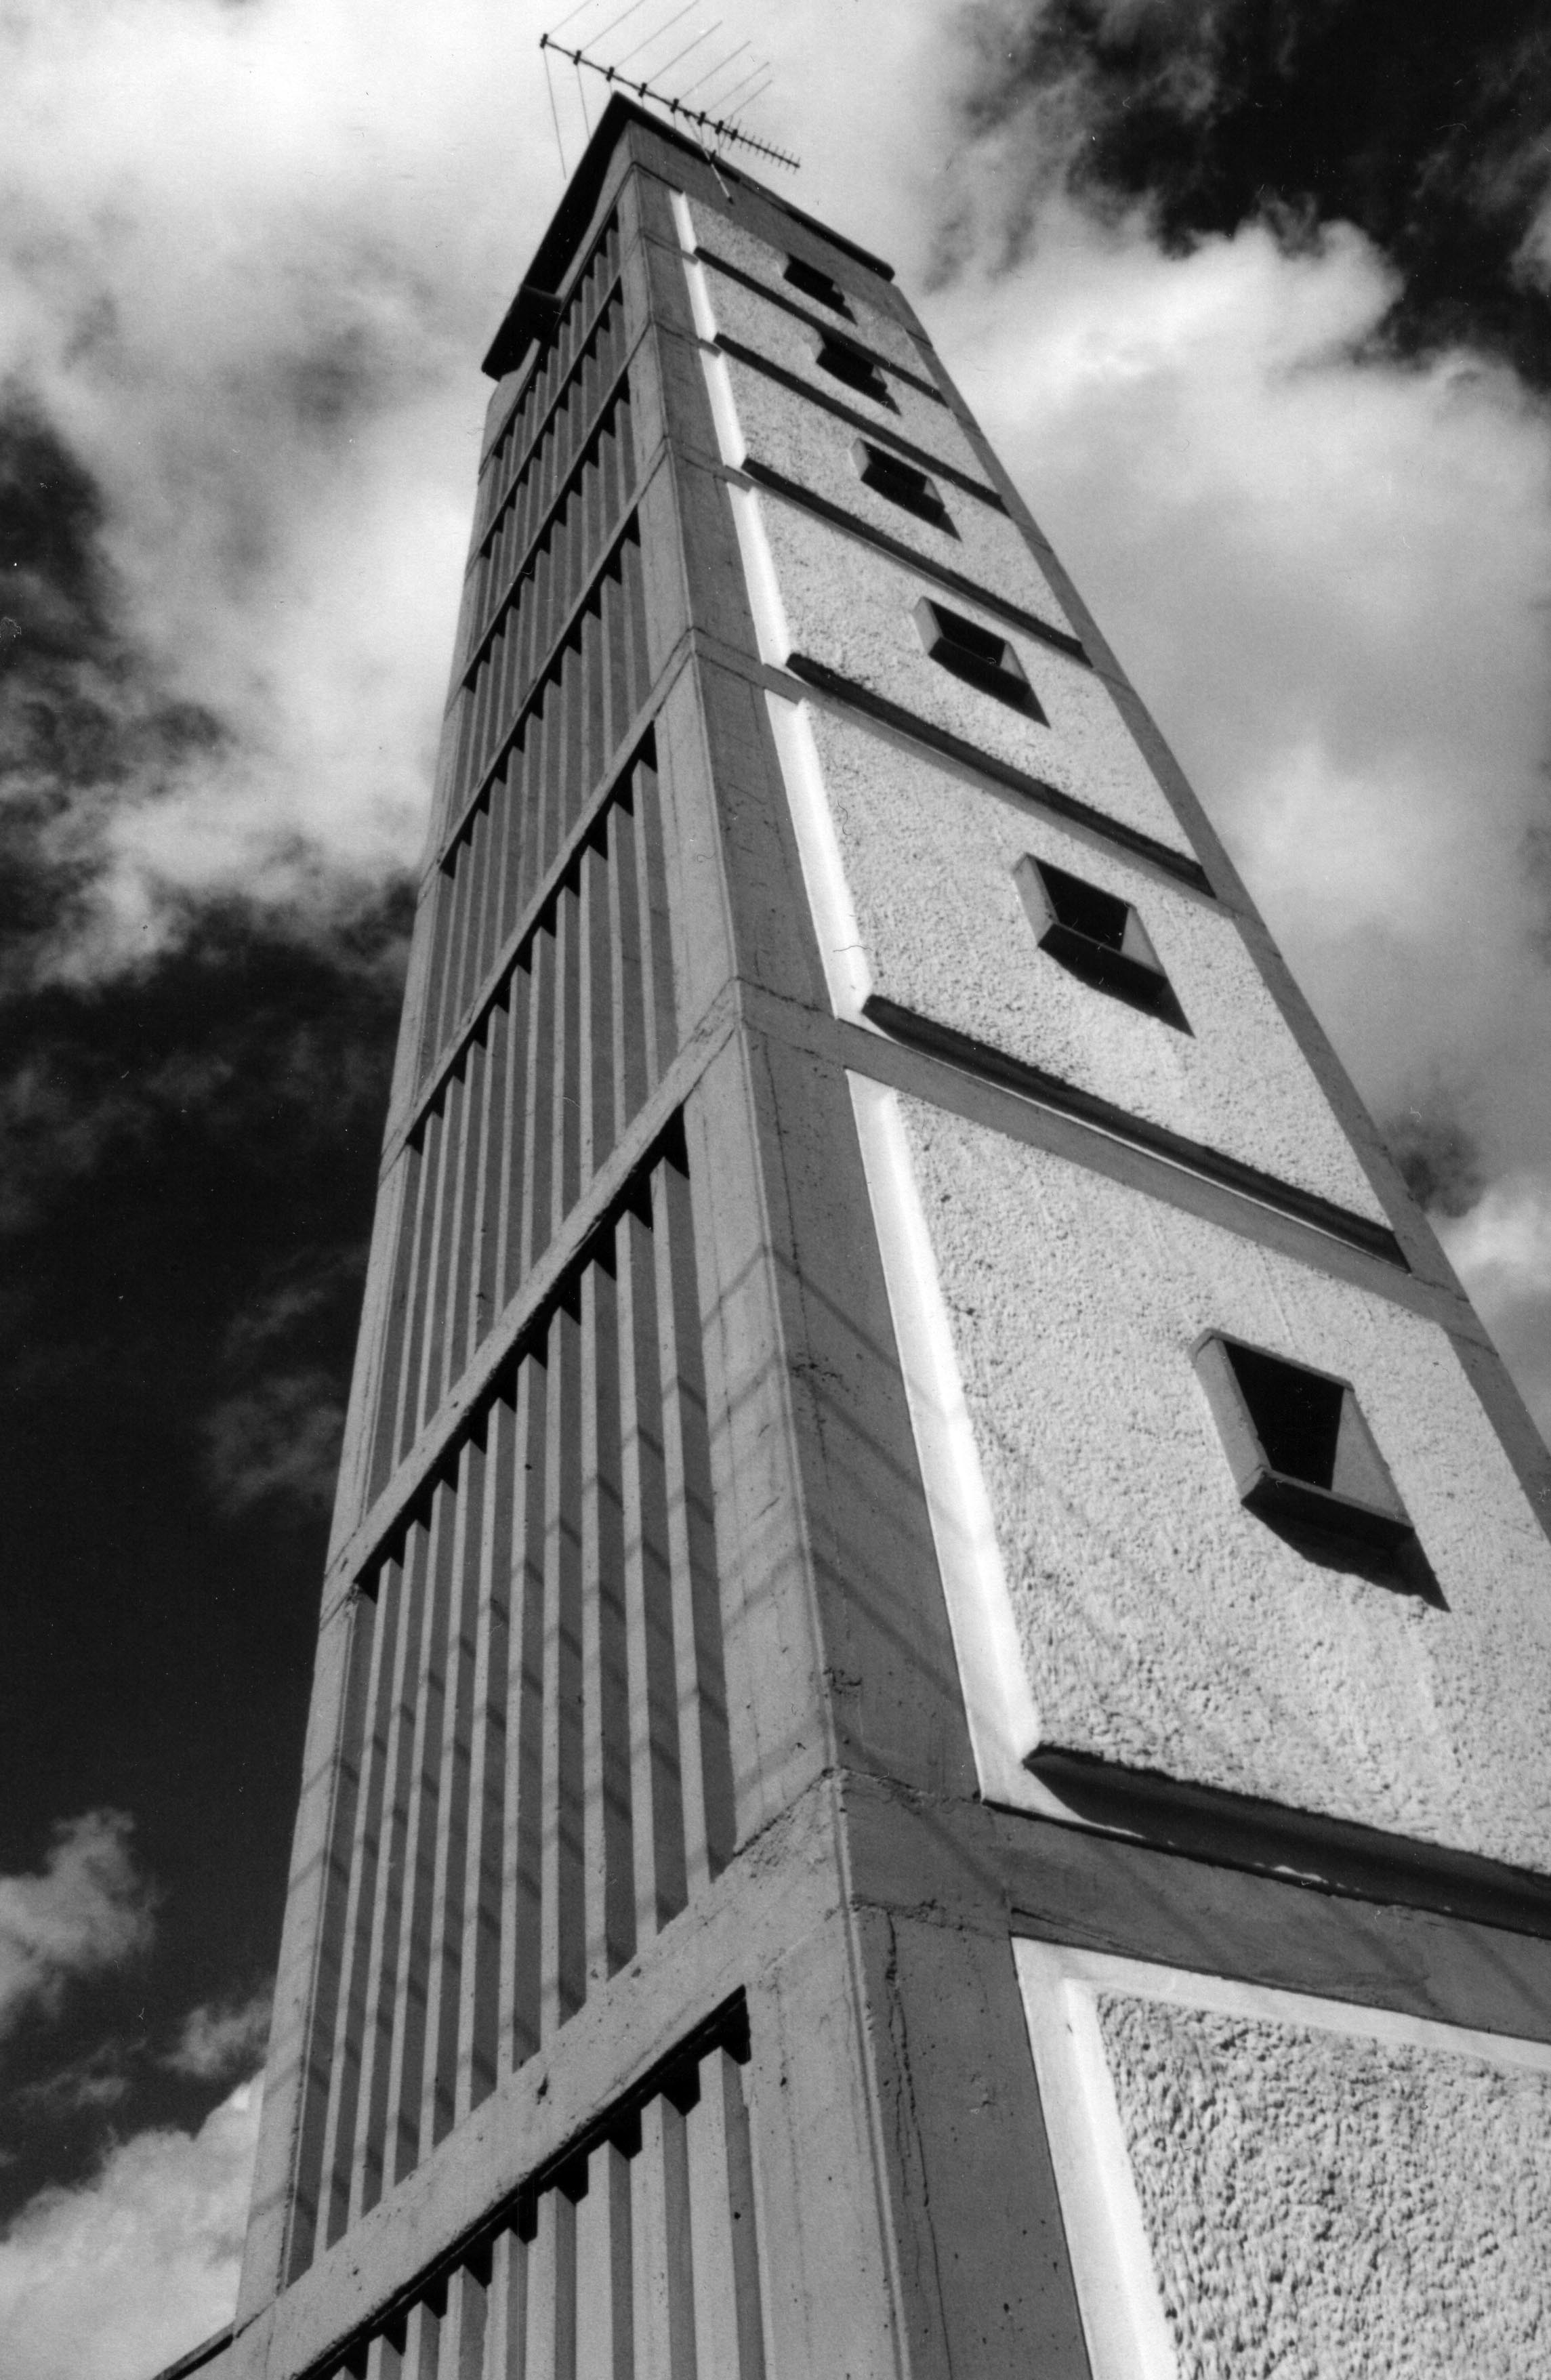 iglesia polo 3.jpg